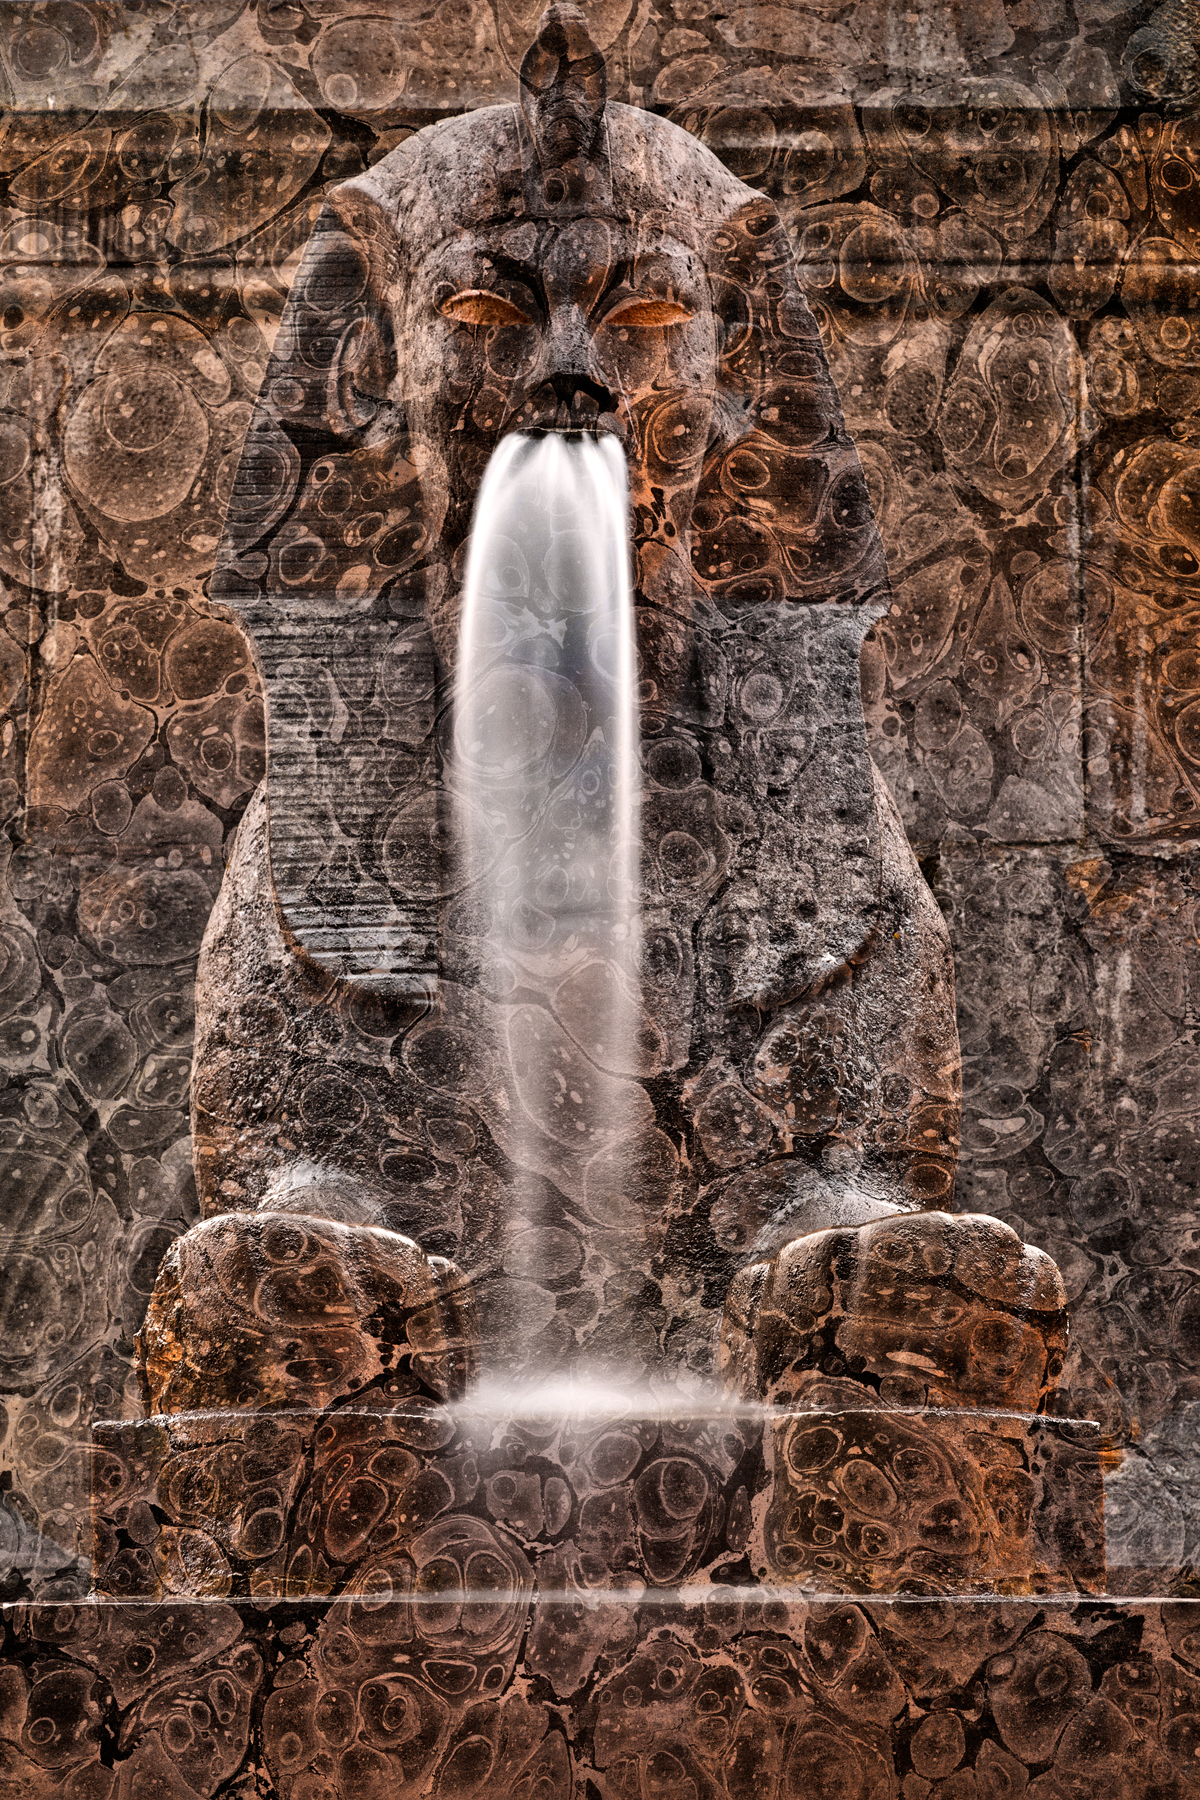 Primeval Sphinx, Abstract, Mythic, Pour, Paris, HQ Photo